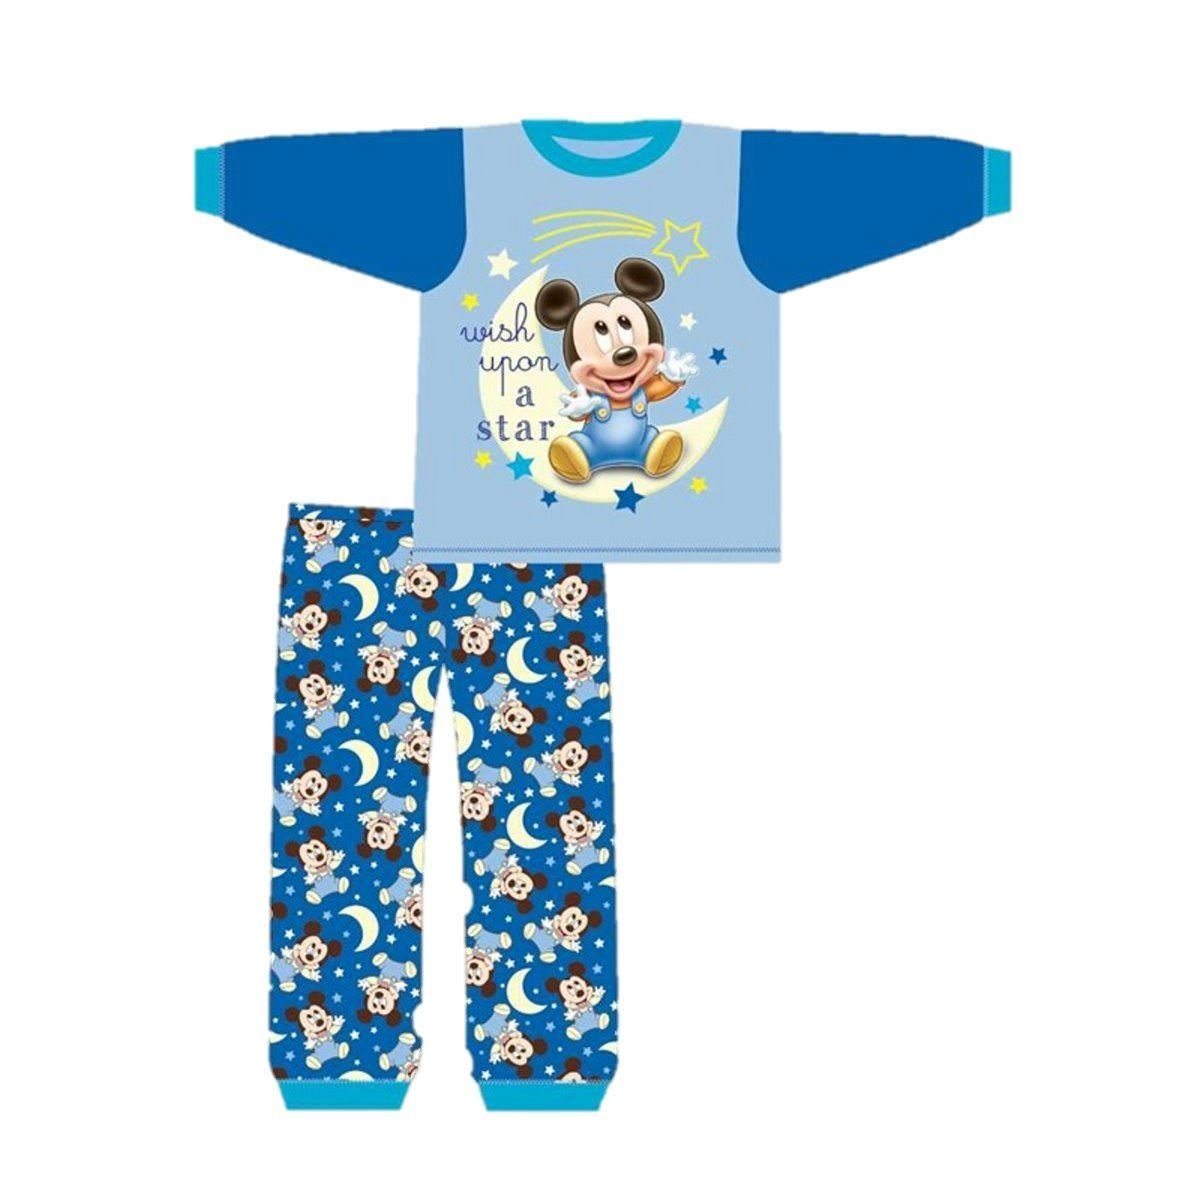 TDP Kids Snuggle fit pjs Pajamas Boys Girls Gift Sleepwear Nightwear Character